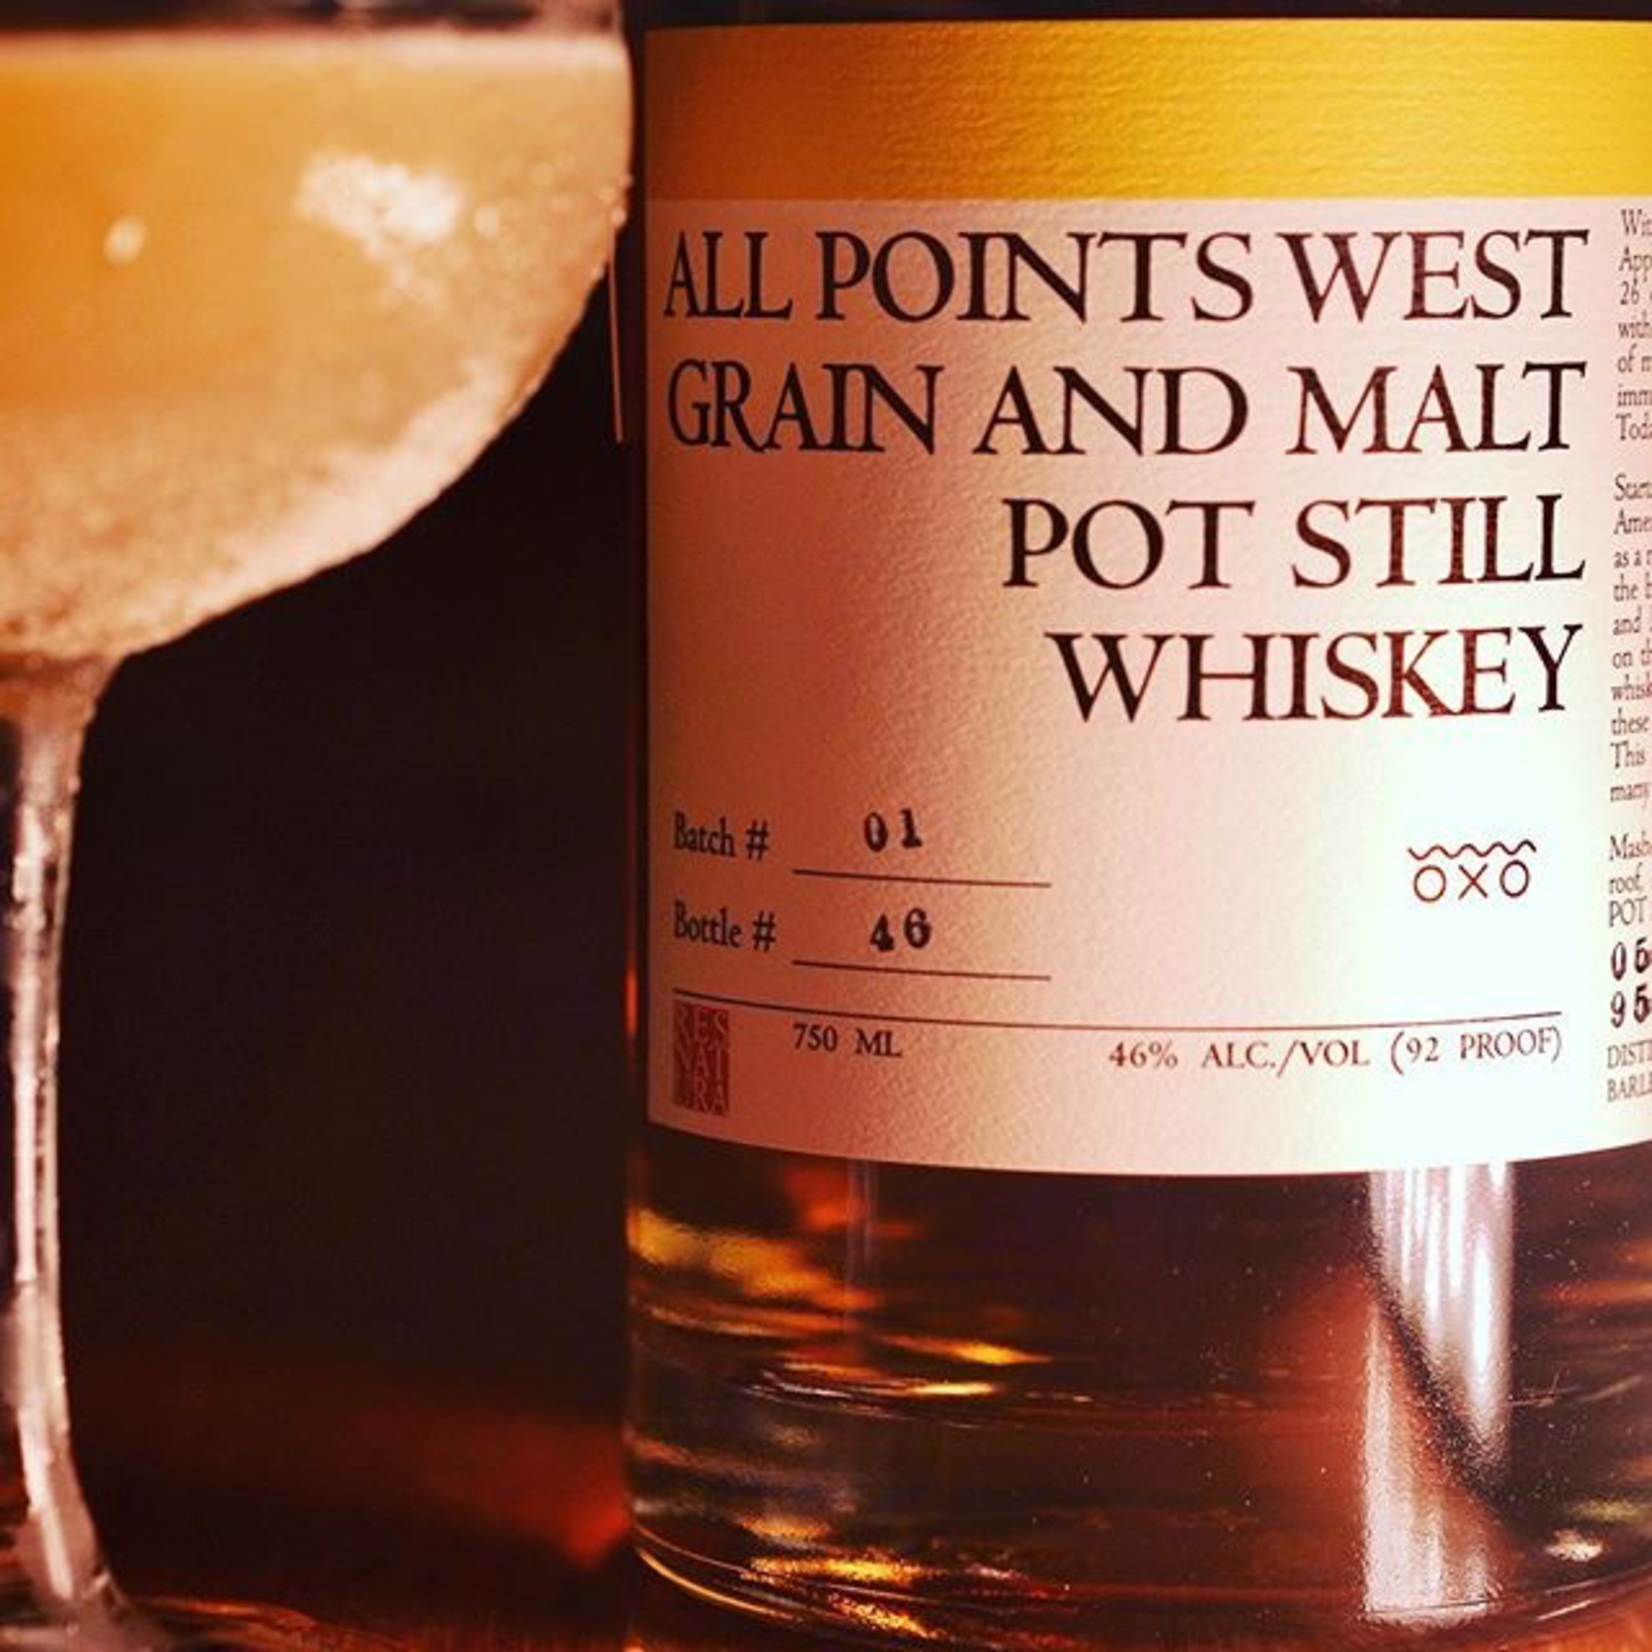 Spirits All Points West Grain and Malt Pot Still Whiskey